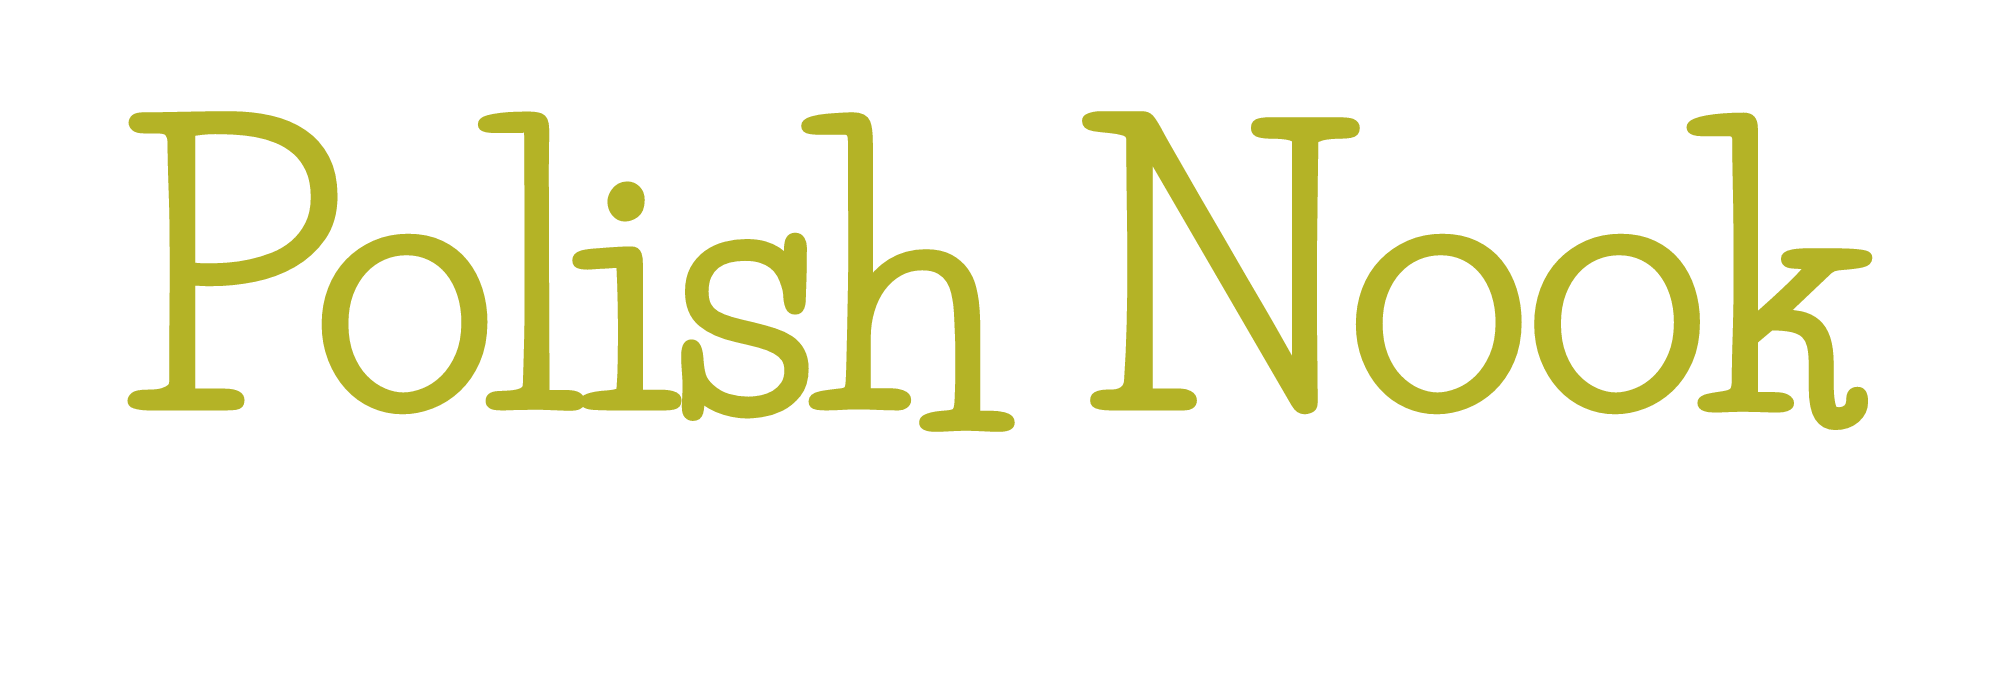 Polish Nook-logo (1).png